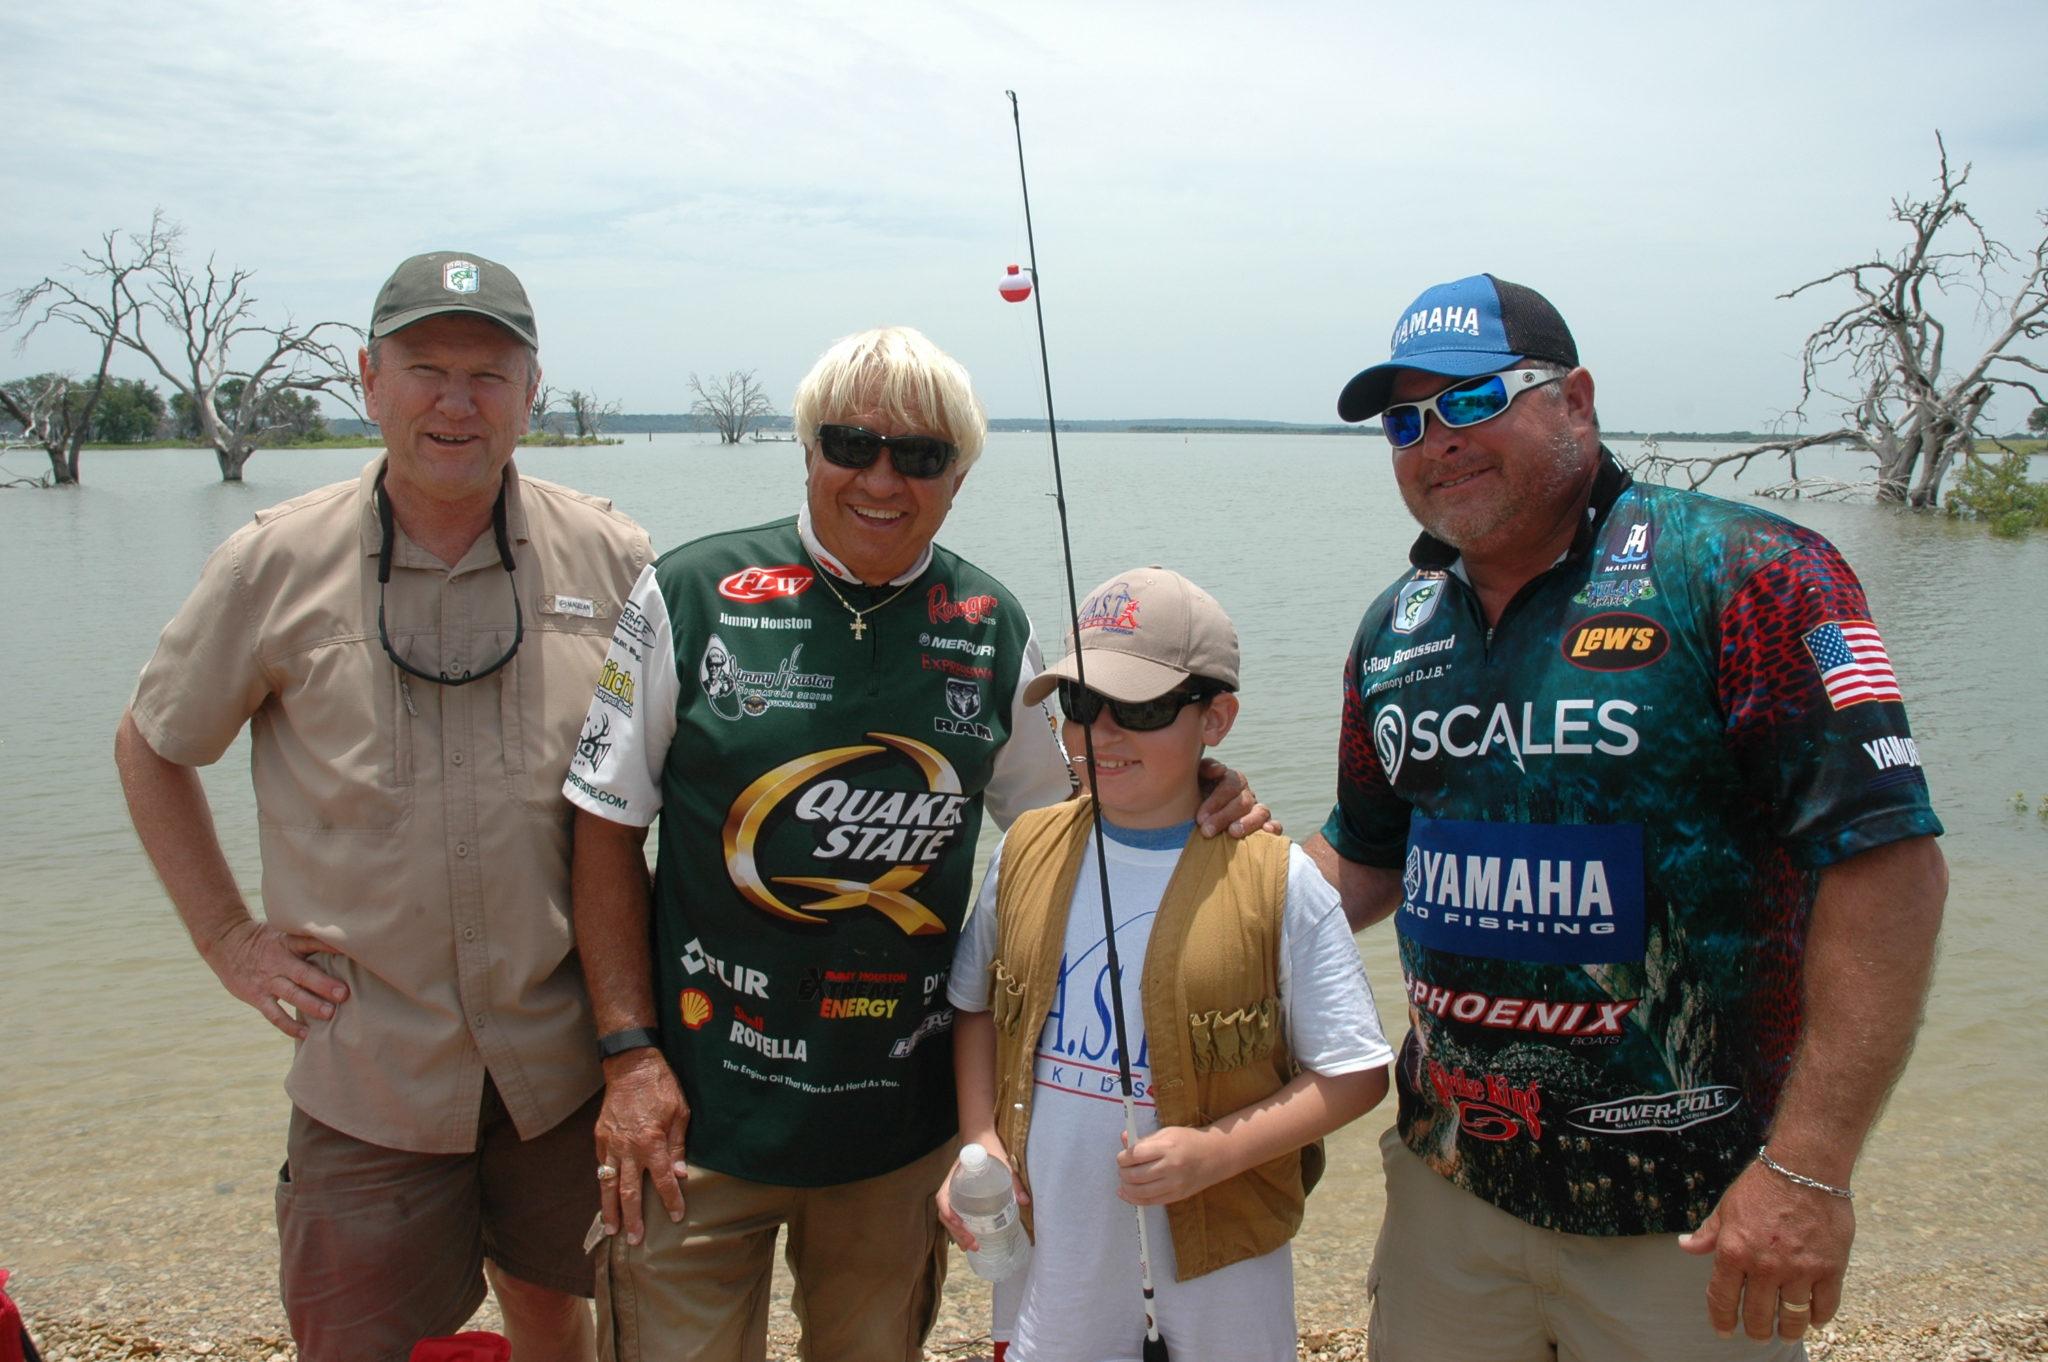 Haley's Heroes C.A.S.T. for Kids Lake Waco Present By Texas Farm Bureau Insurance